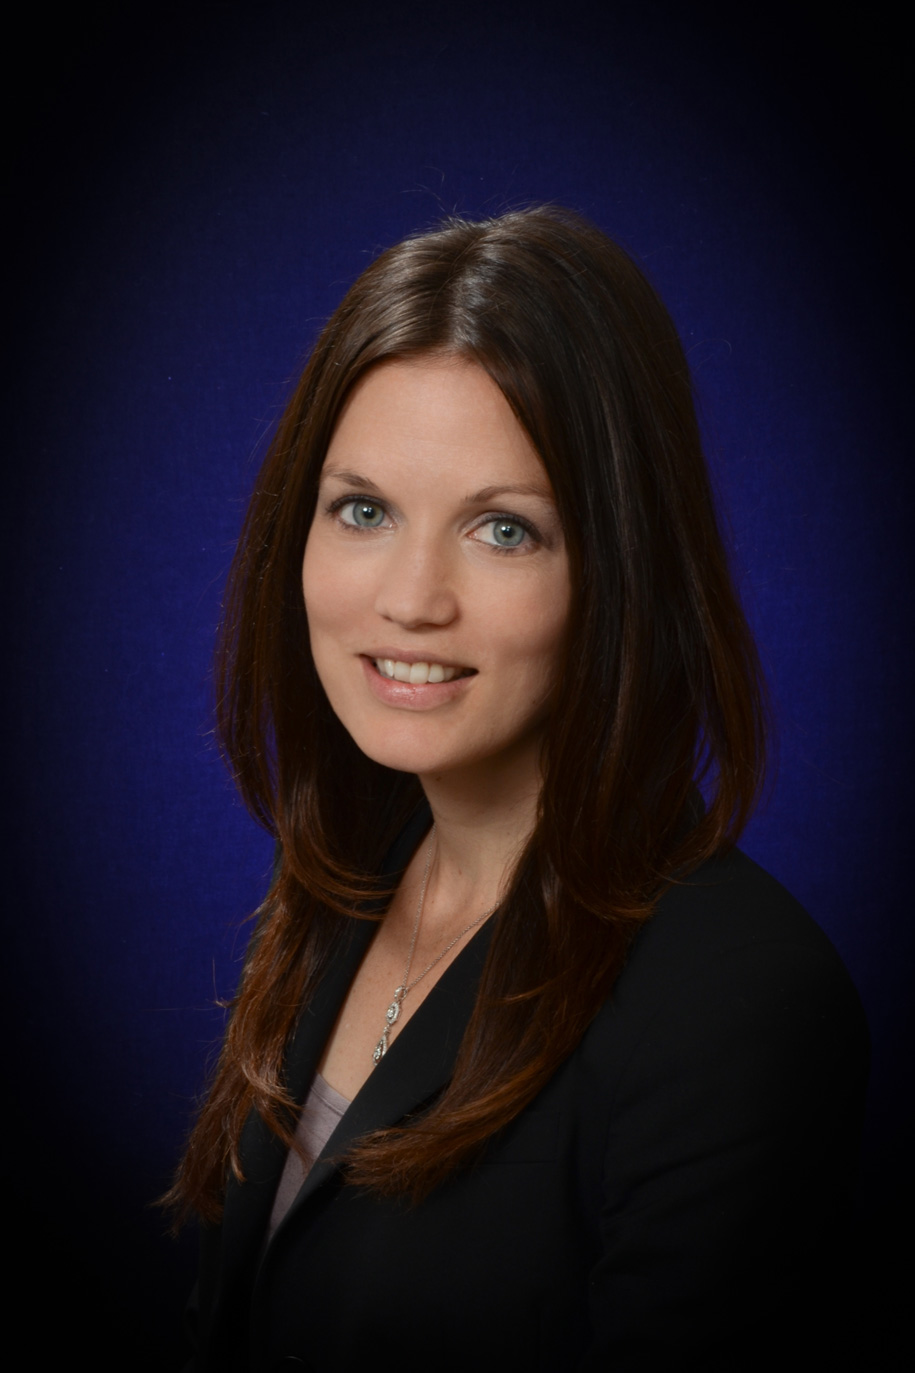 Kimberly Dorani ACAS MAAA  Berkley Life Sciences